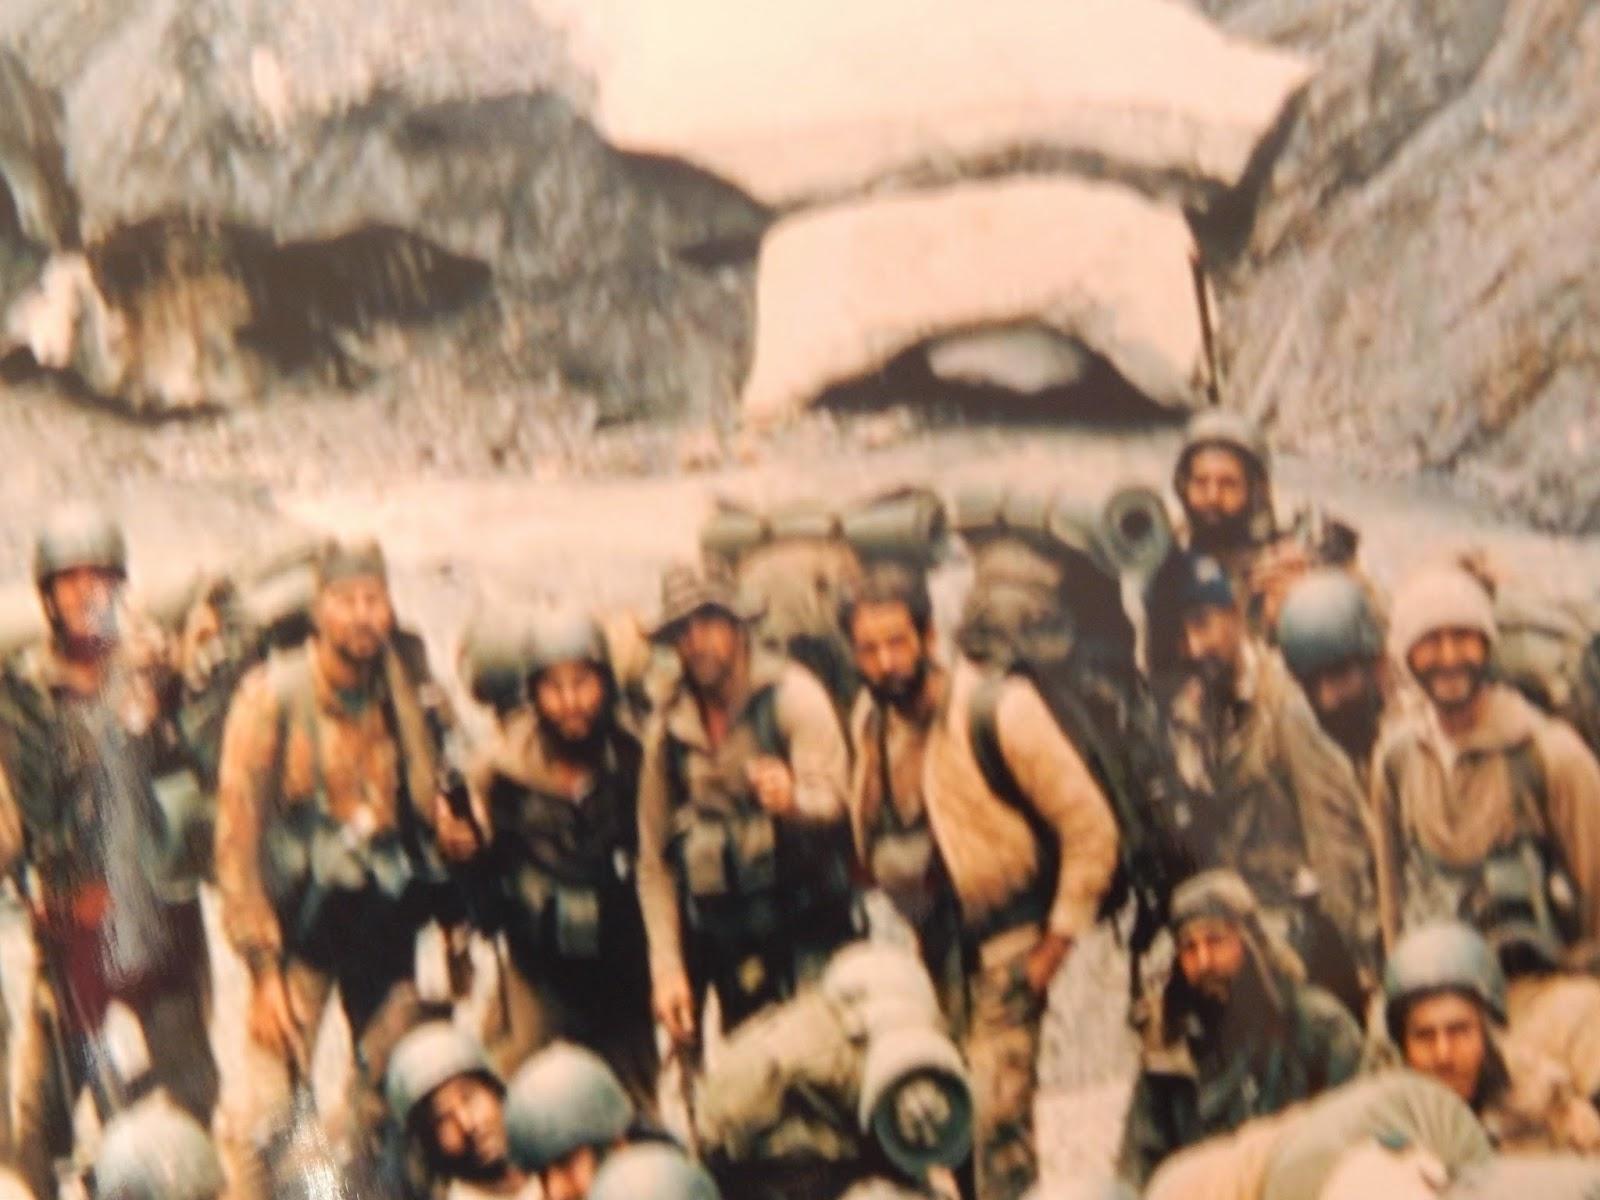 Kargil War Pictures Wallpapers | gdlawct com